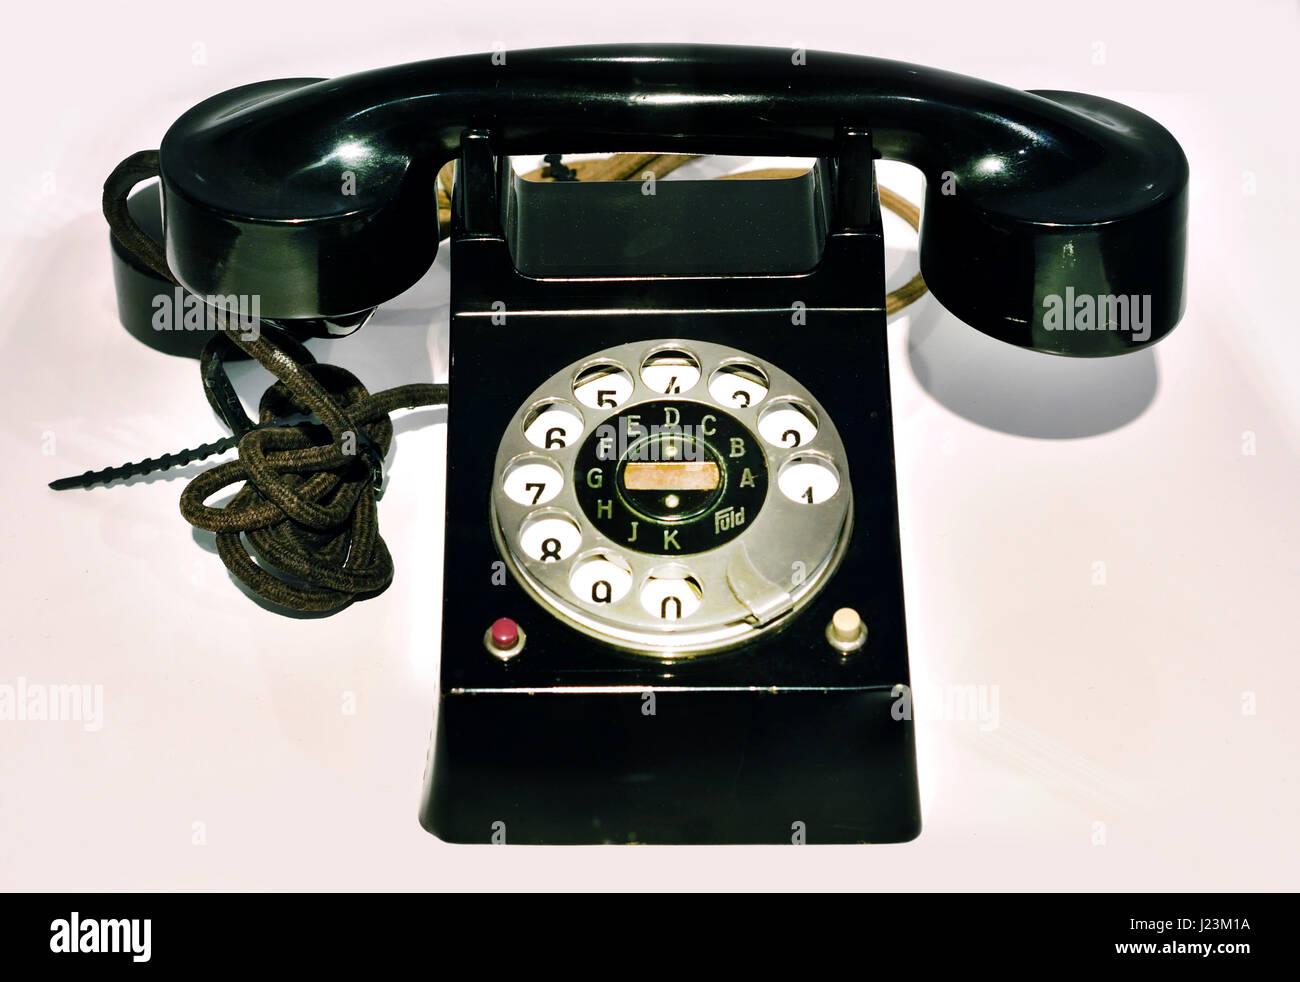 Bauhaus phone 1920 version H.Fuld & Co. Telefonbau and Normazeit (GmbH, Frankfurt am Main) - Stock Image